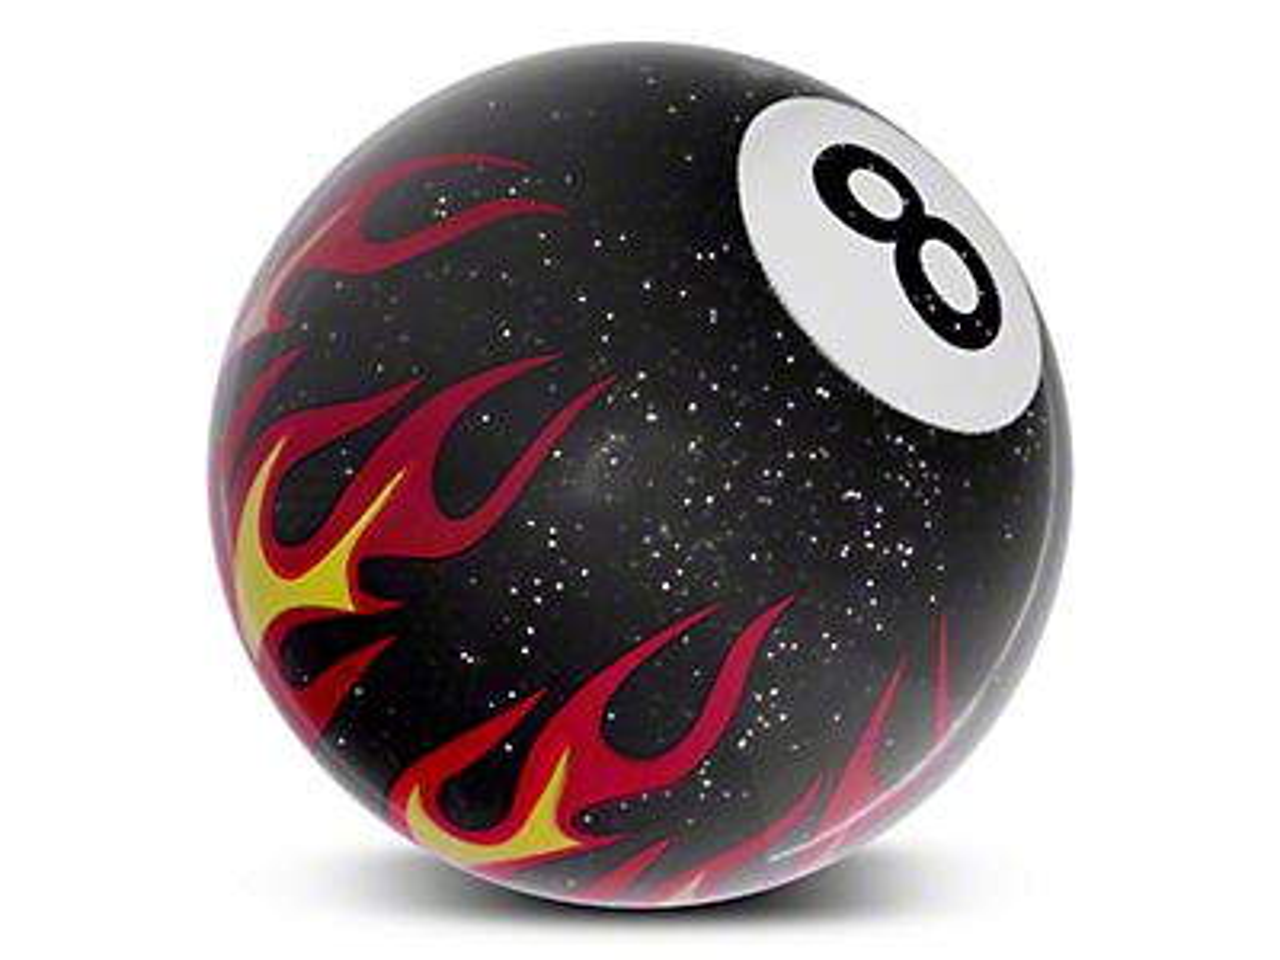 Alterum Black 8 Ball Flame Shift Knob (79-04 All)